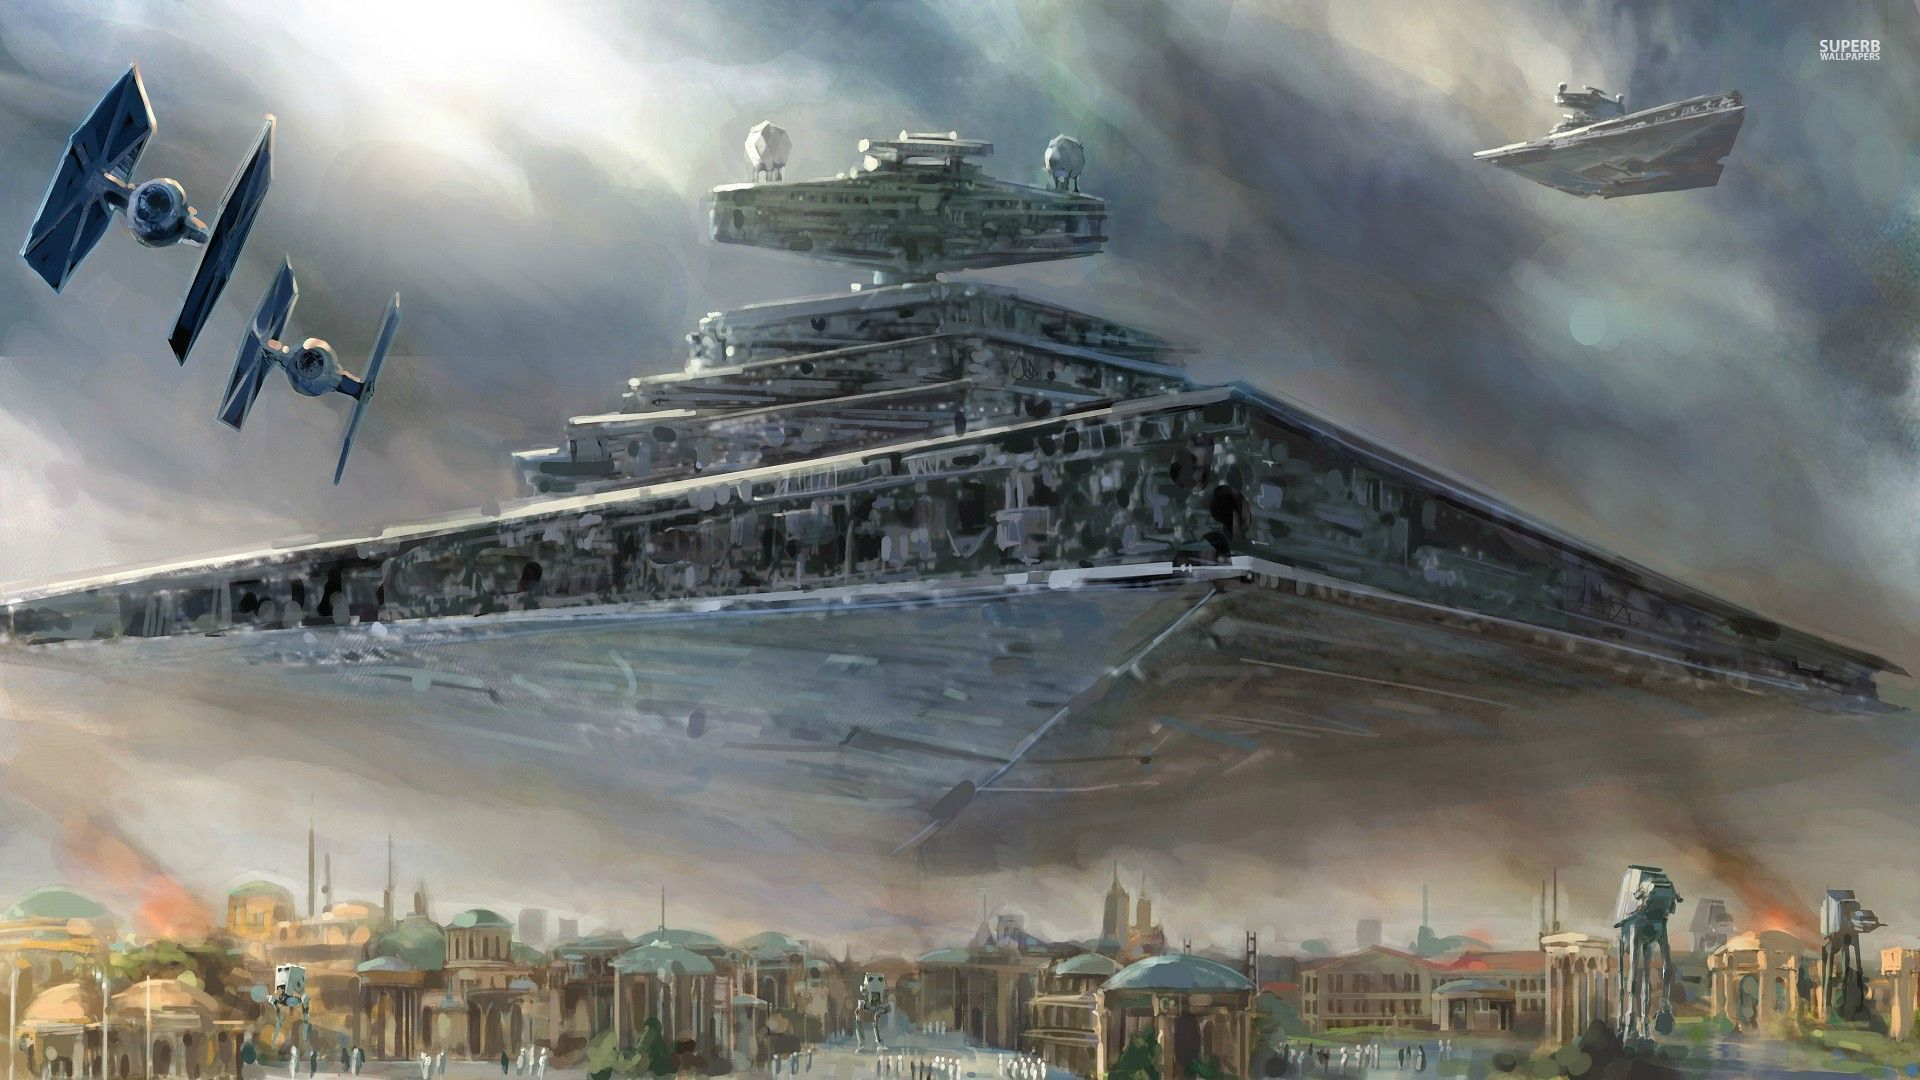 Free Download High Resolution Star Wars Ships Widescreen Hd